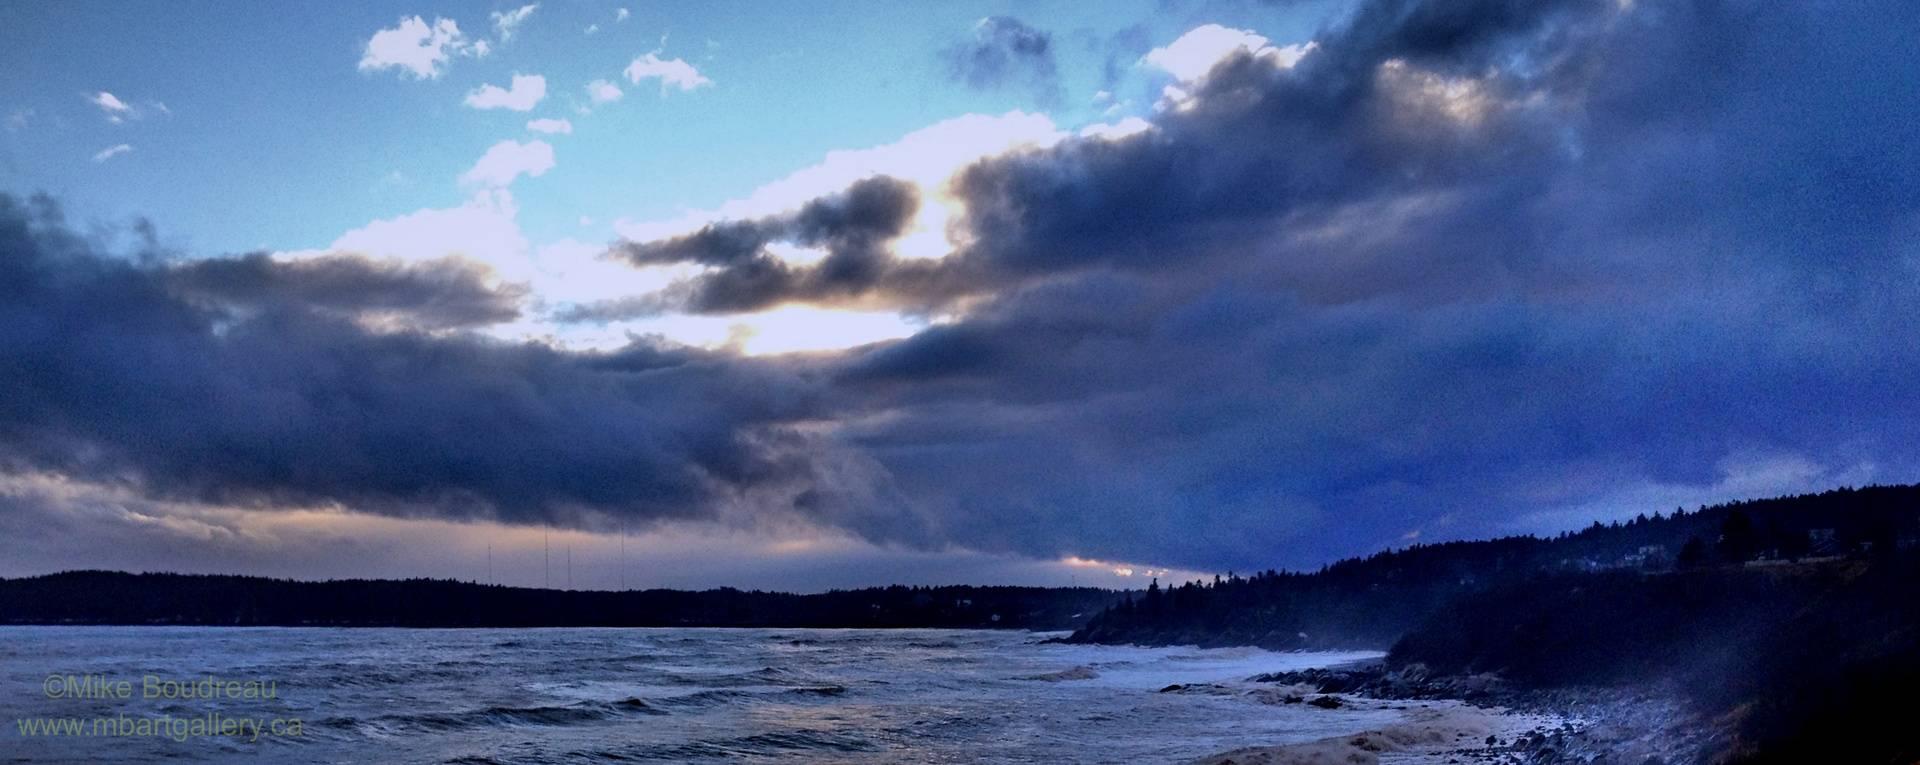 Bay of Fundy Westisde Saint John, Saint John NB